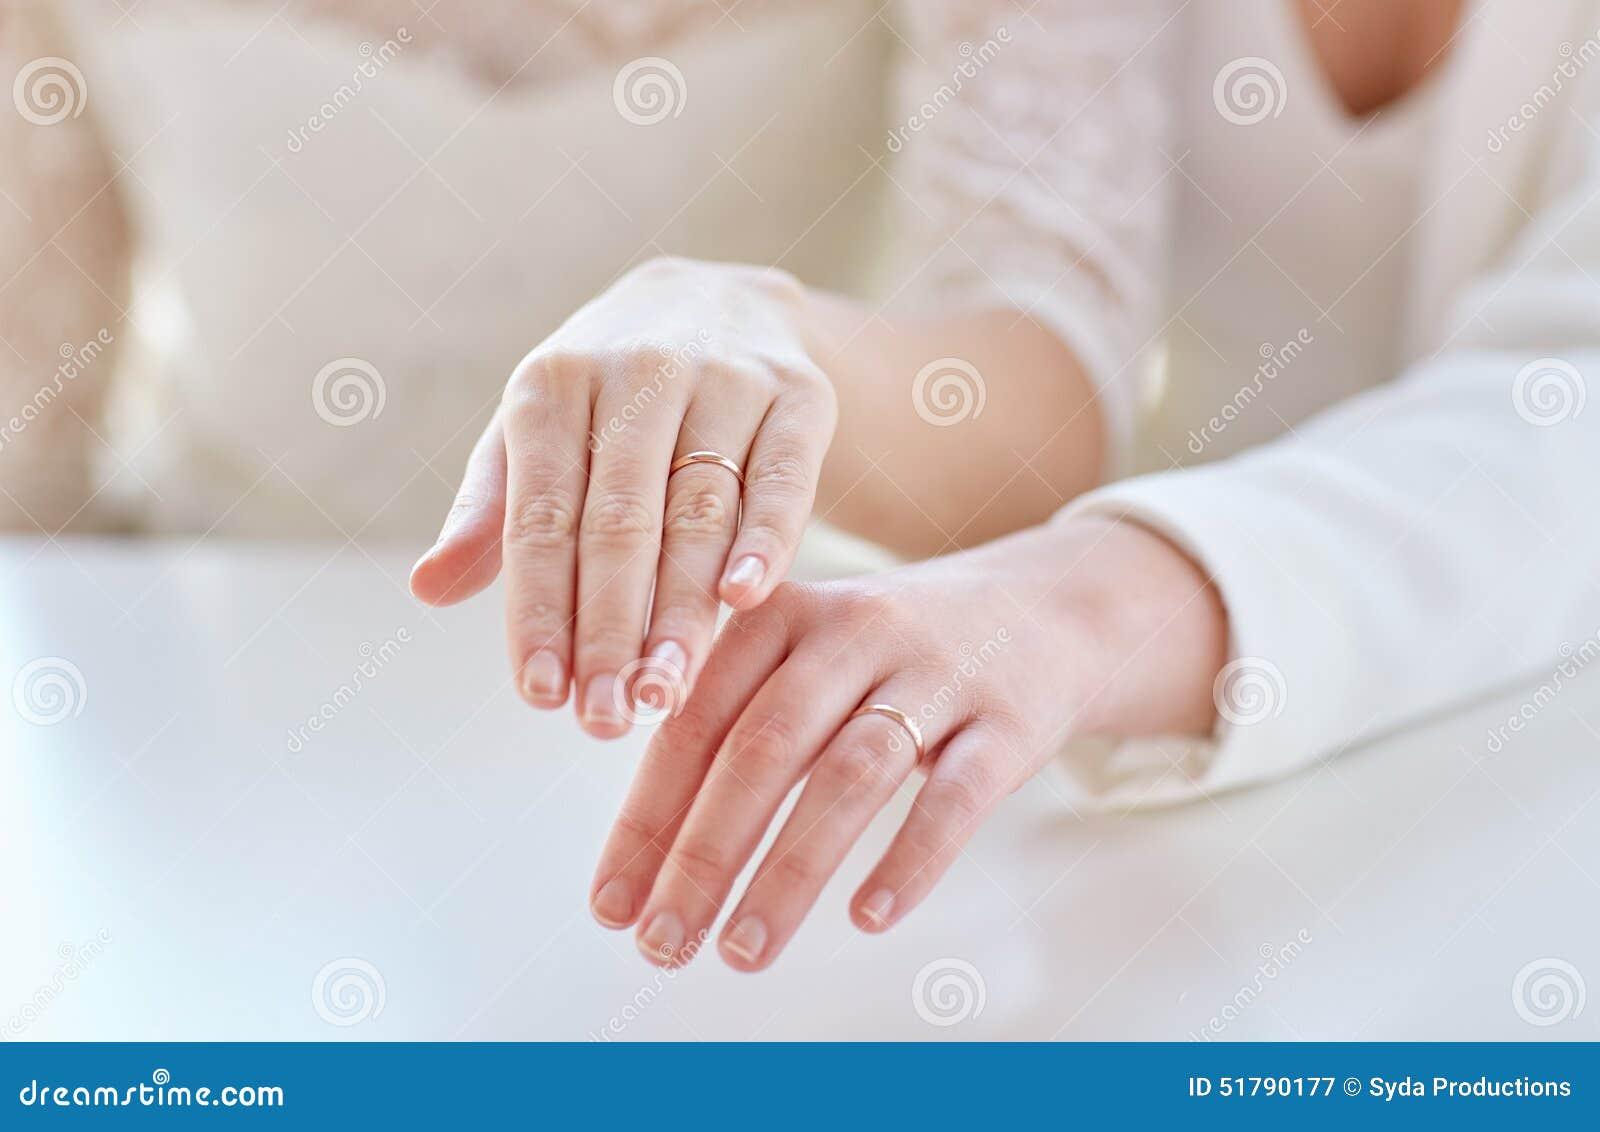 Same Wedding Rings - Wedding Photography